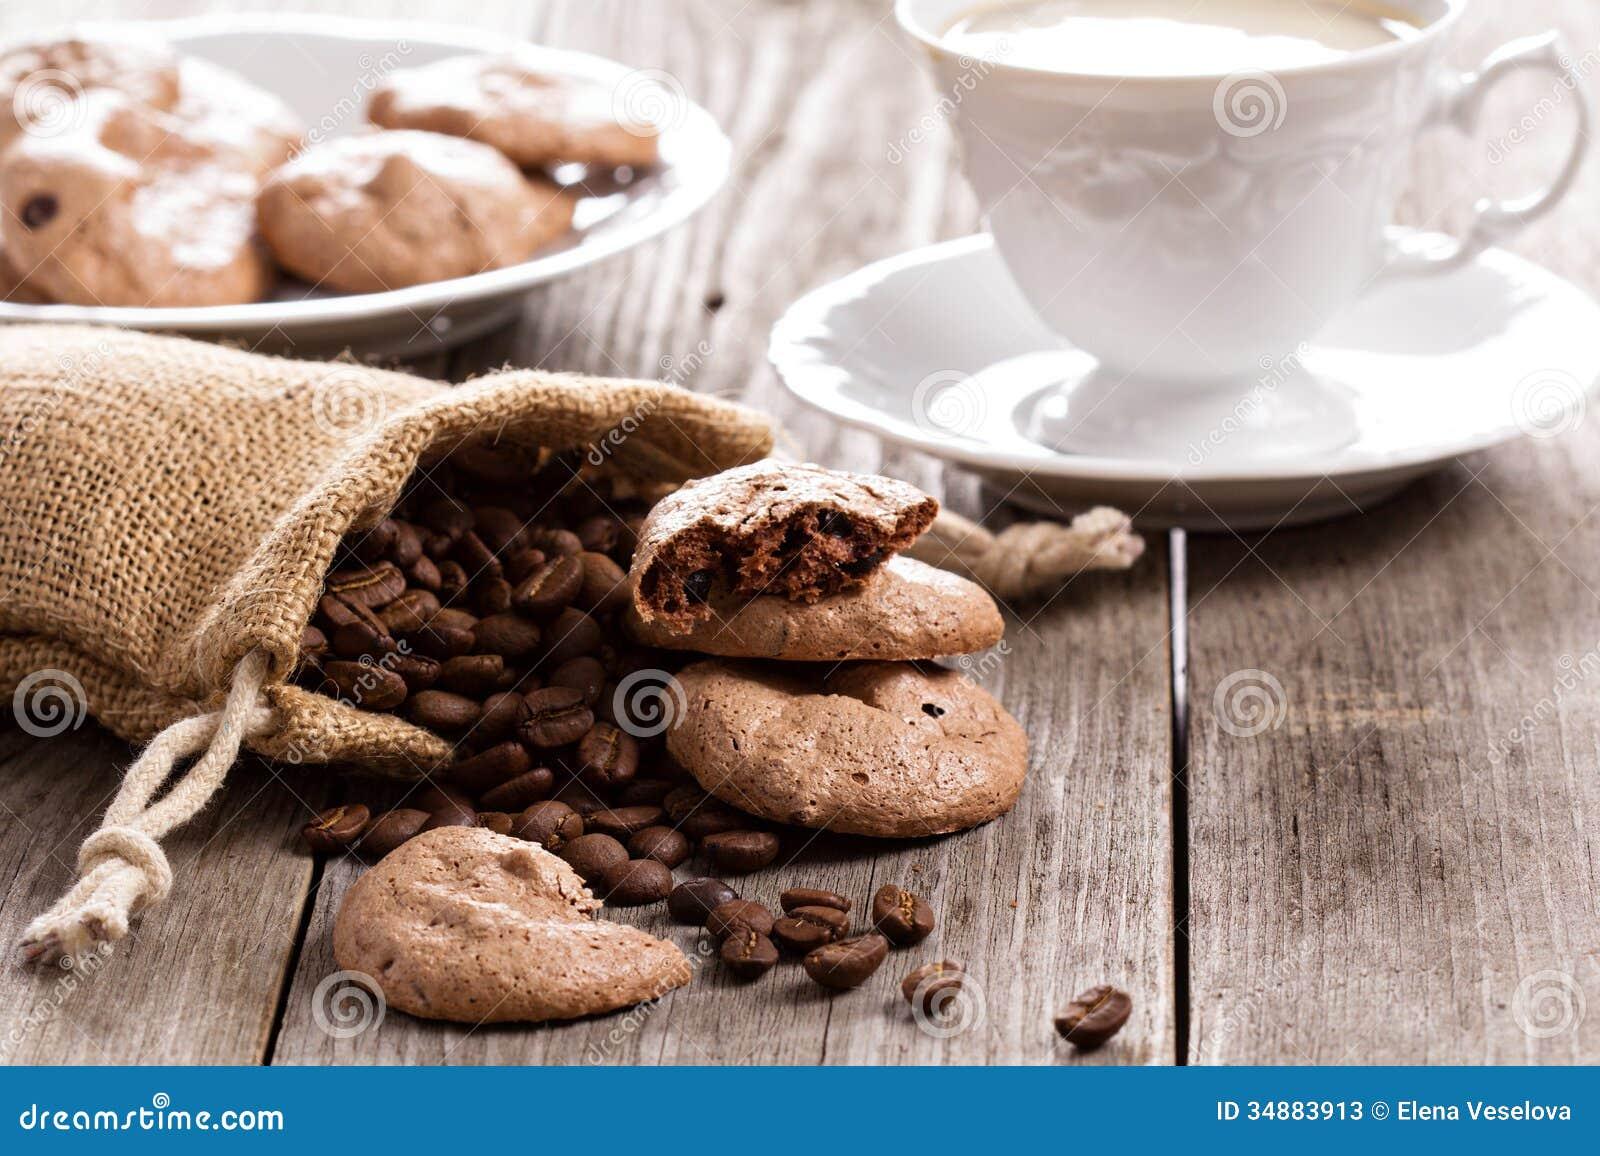 Chocolate Espresso Meringue Cookies Stock Photos - Image: 34883913